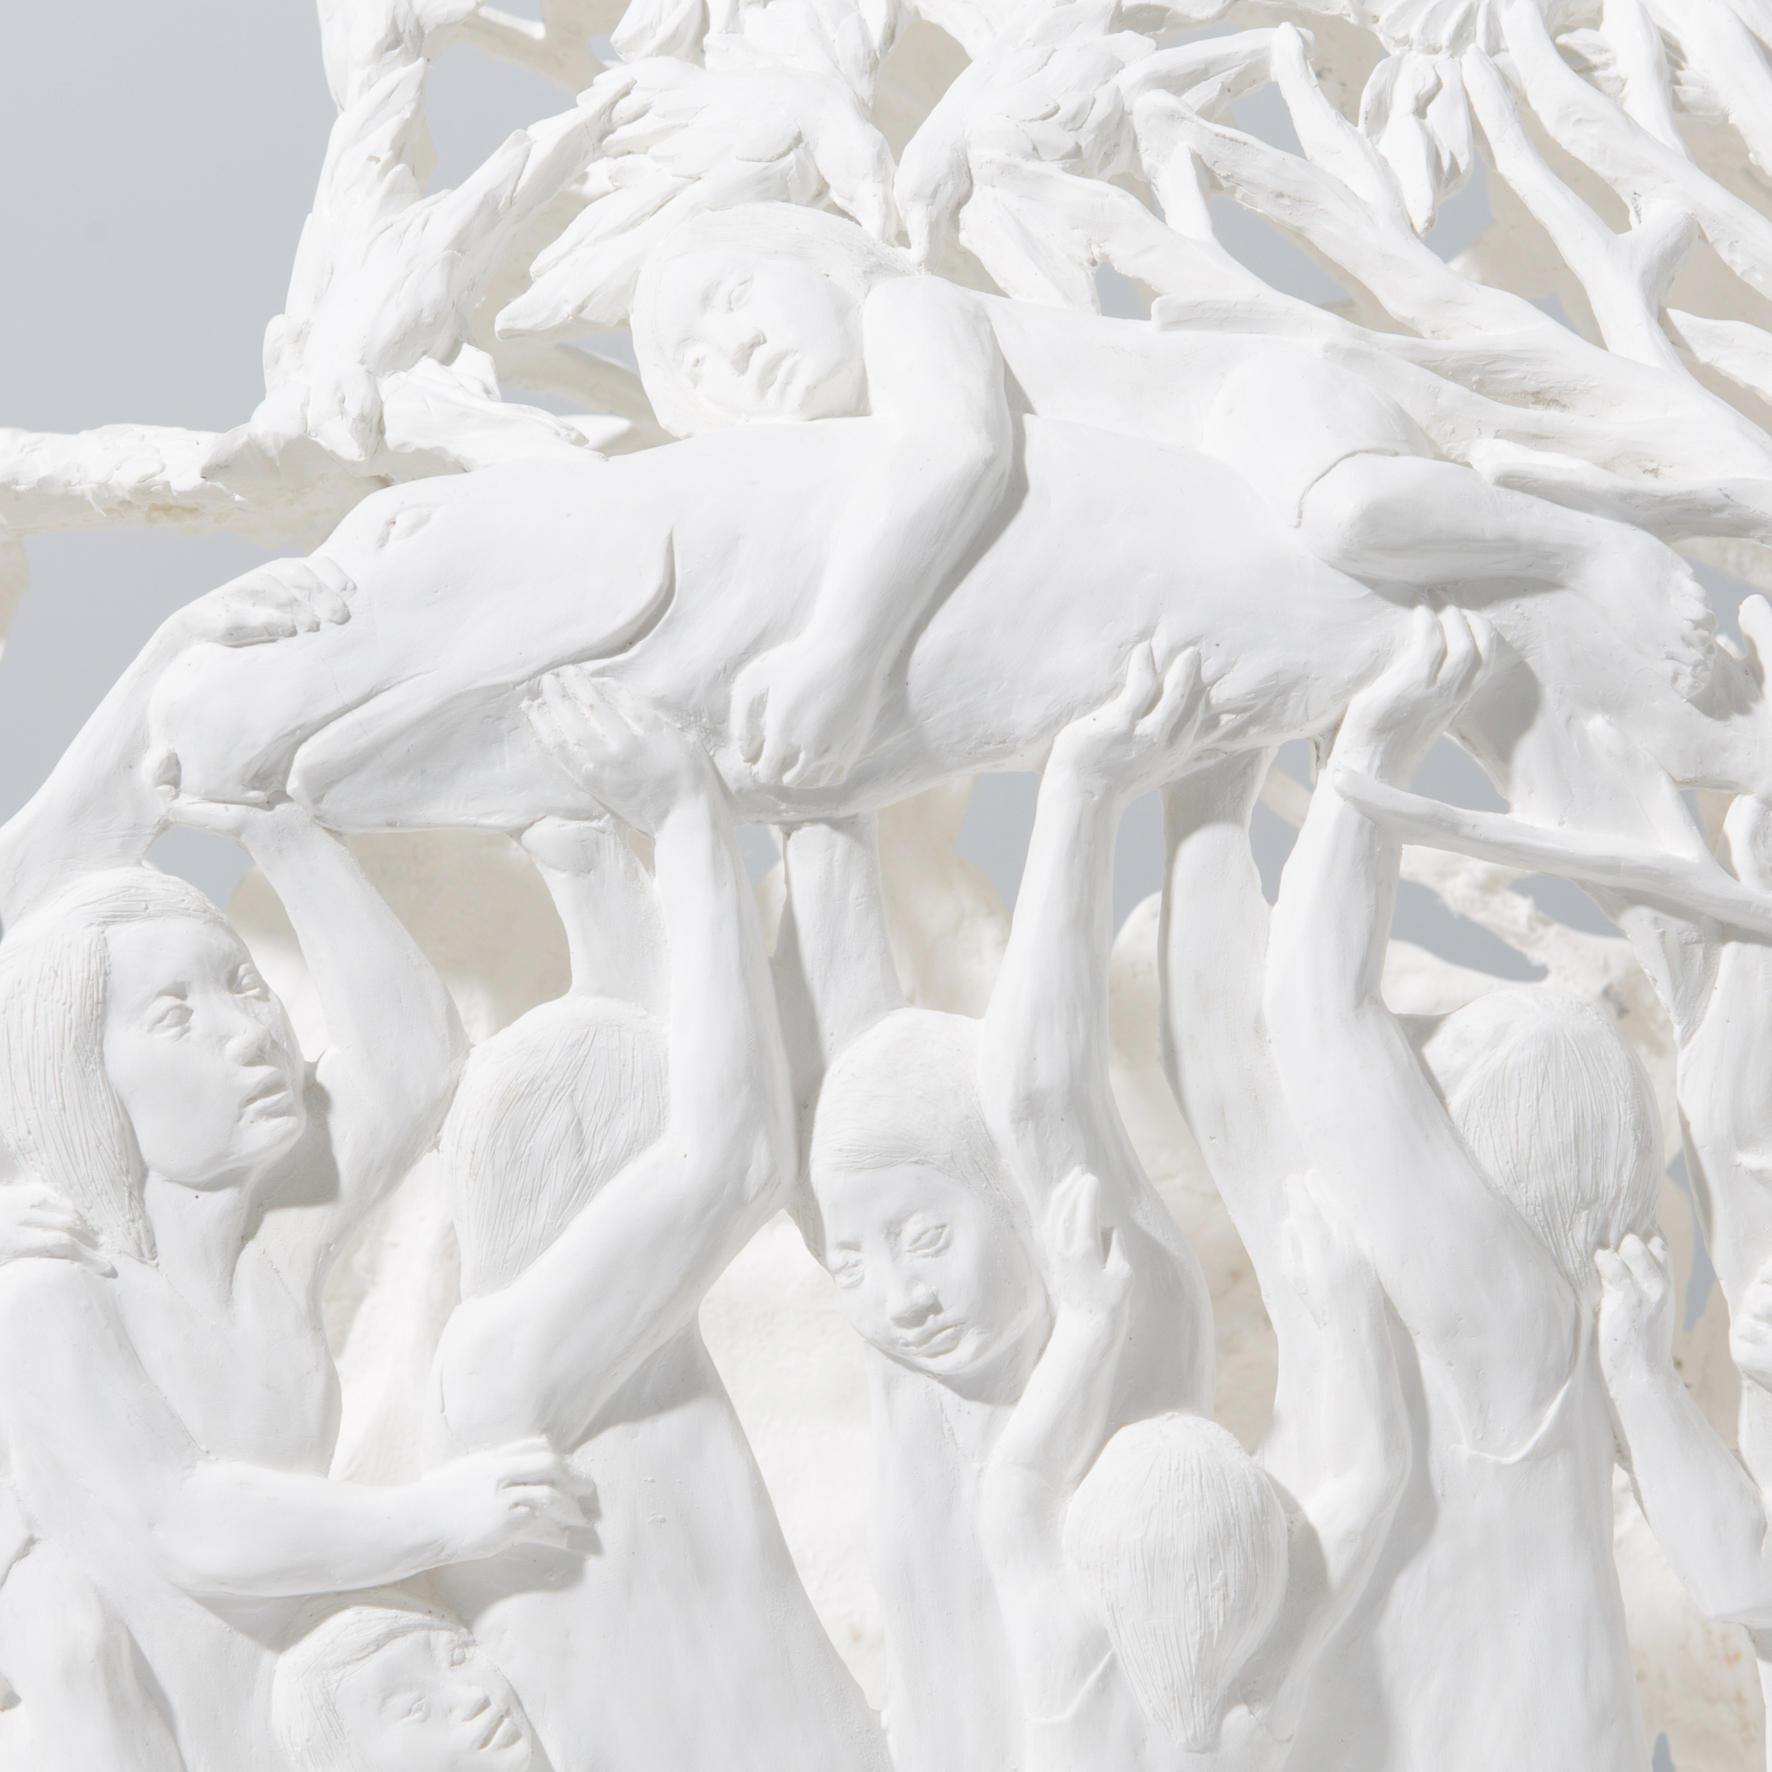 [Review] Michiko Nakatani: What a Tree Dreams